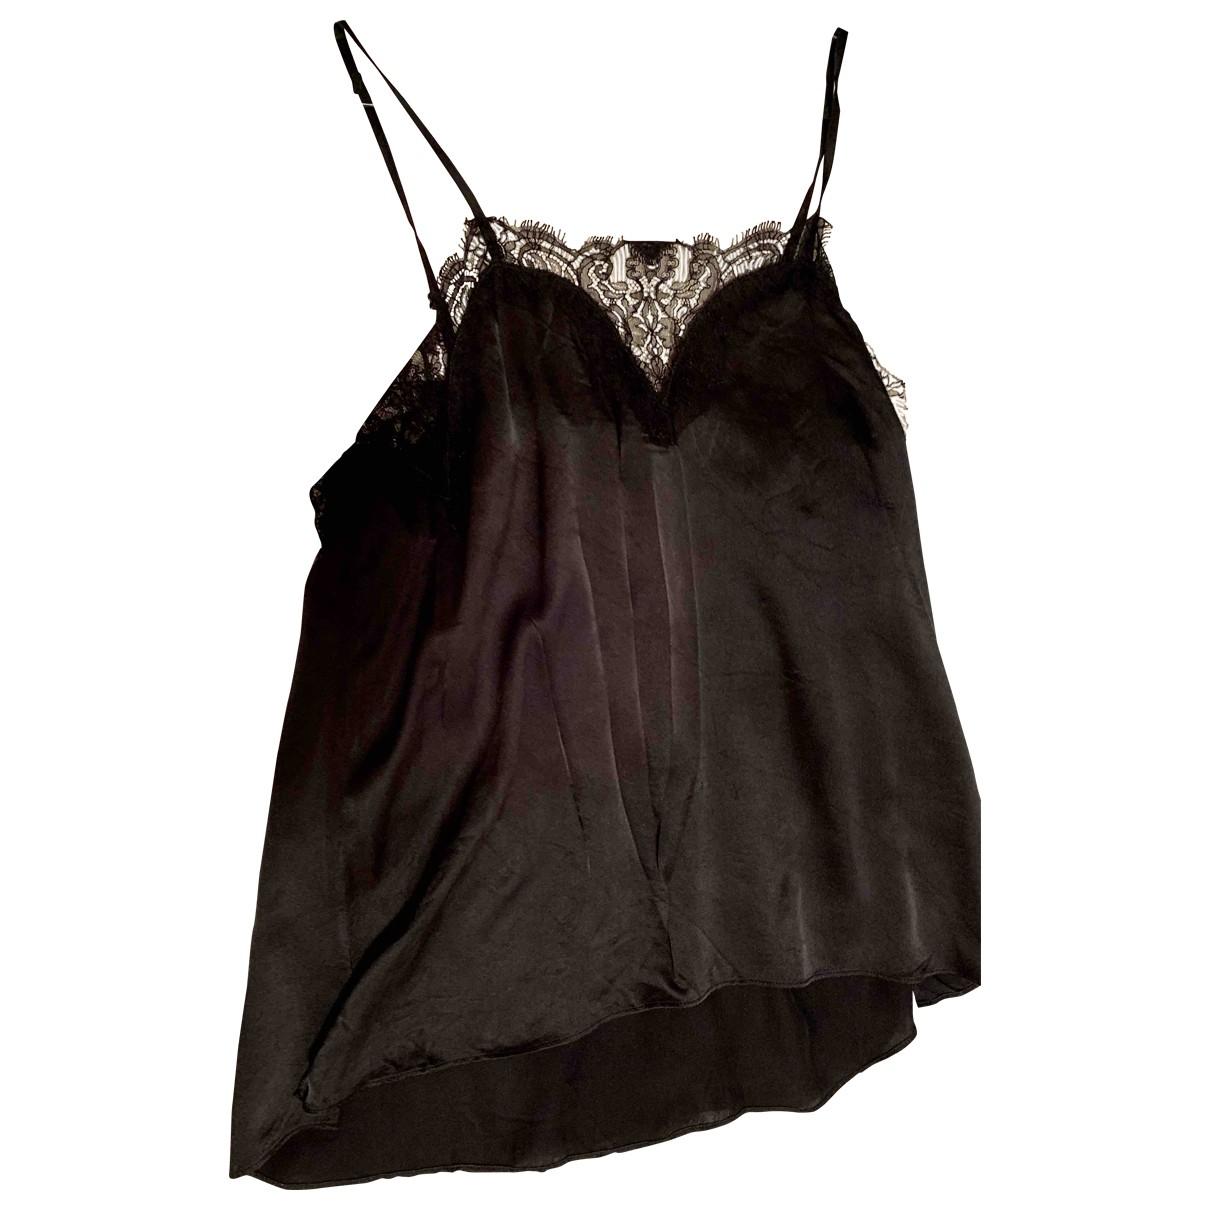 The Kooples - Top Spring Summer 2019 pour femme en soie - noir